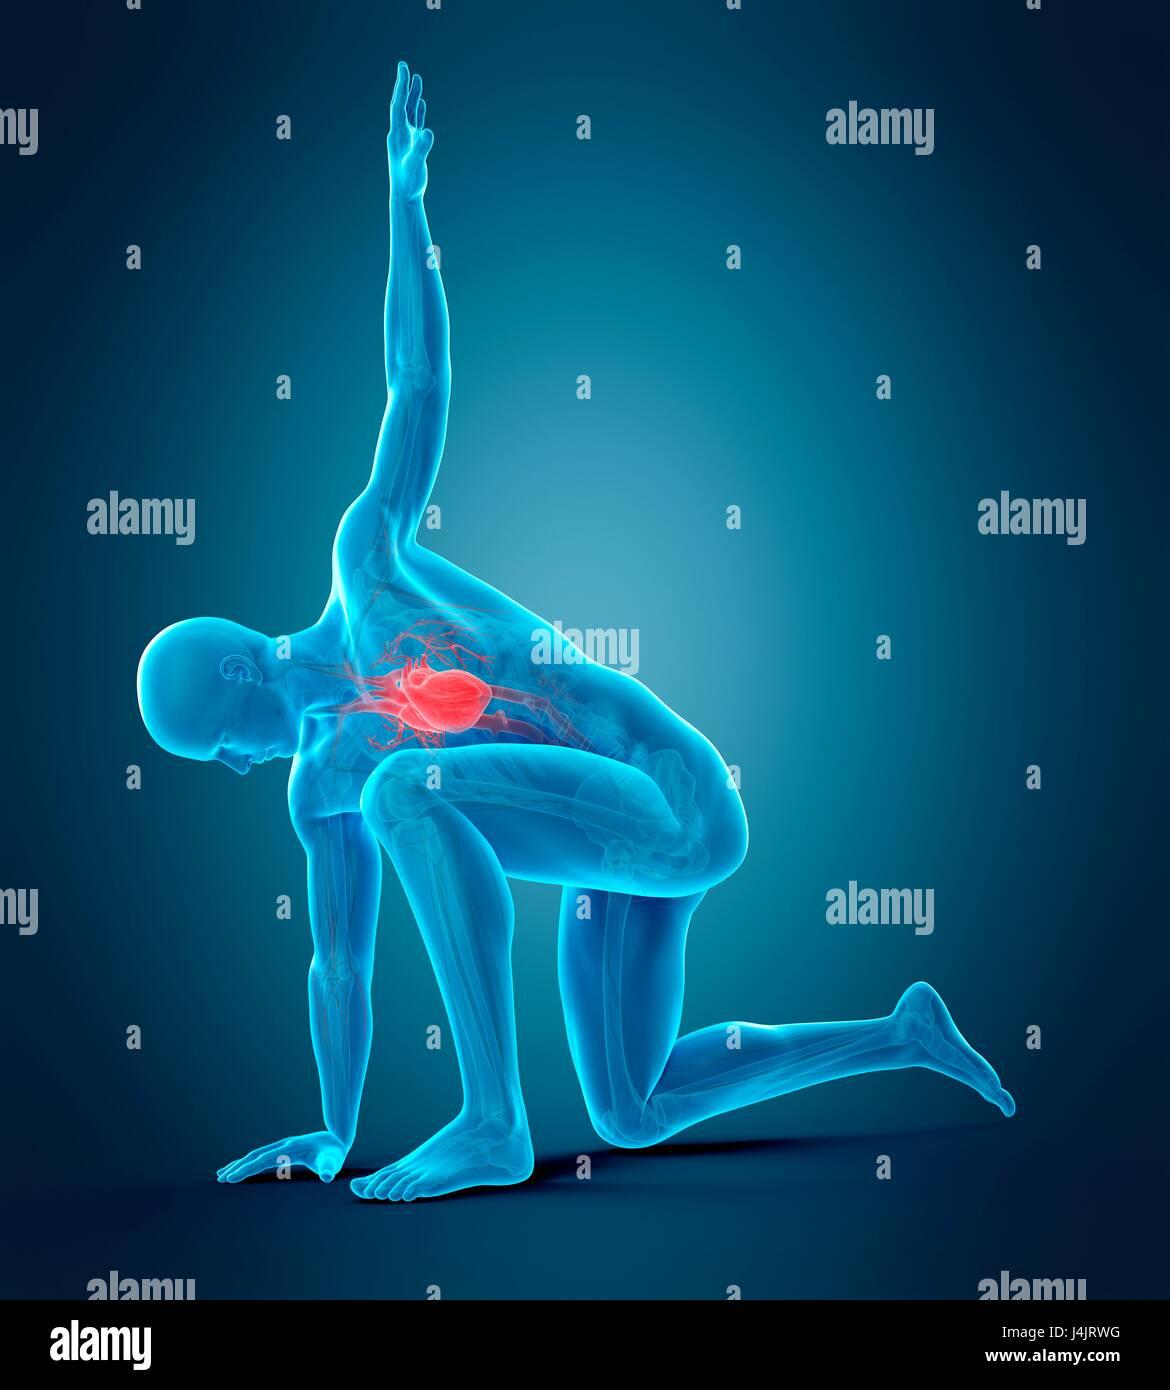 Anatomy of person kneeling with arm raised, illustration Stock Photo ...